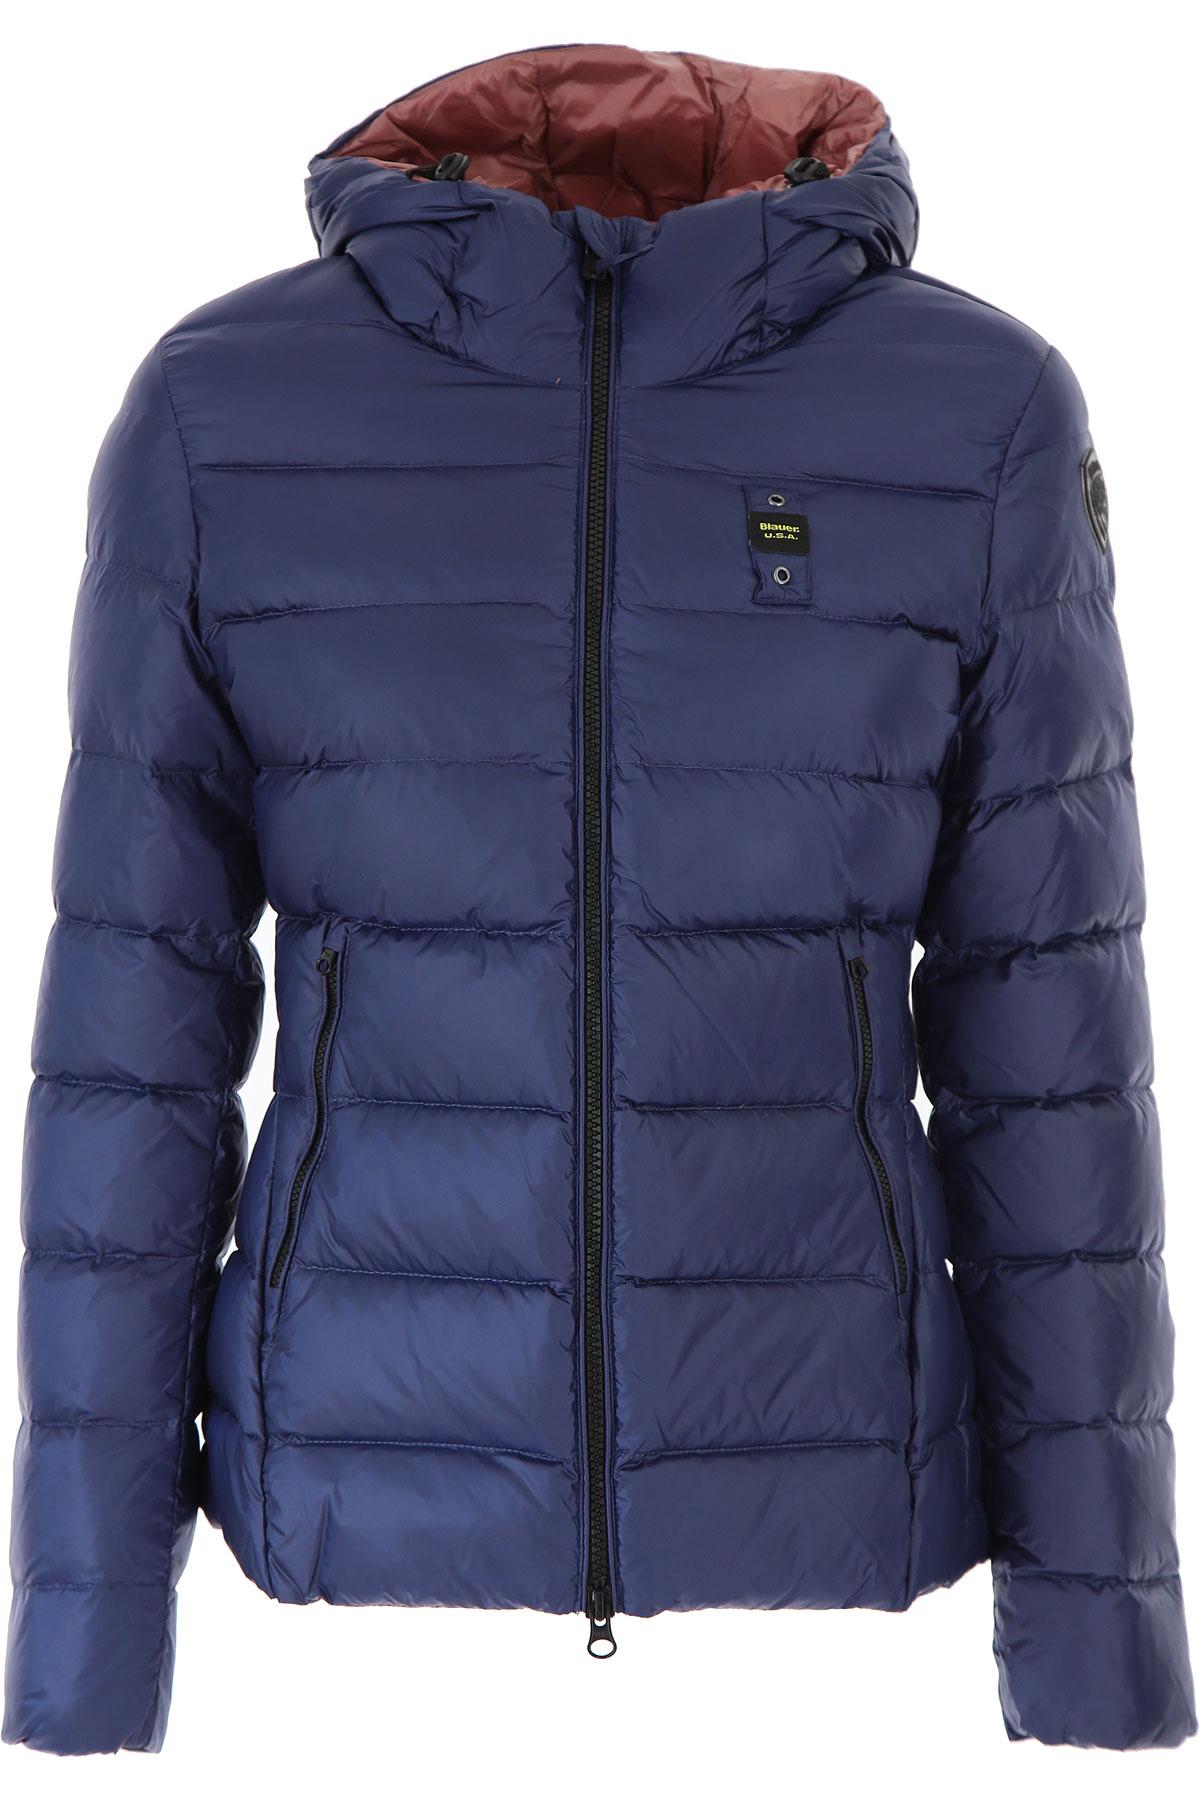 Blauer Down Jacket for Women, Puffer Ski Jacket On Sale, Night Blue, polyester, 2019, 10 2 6